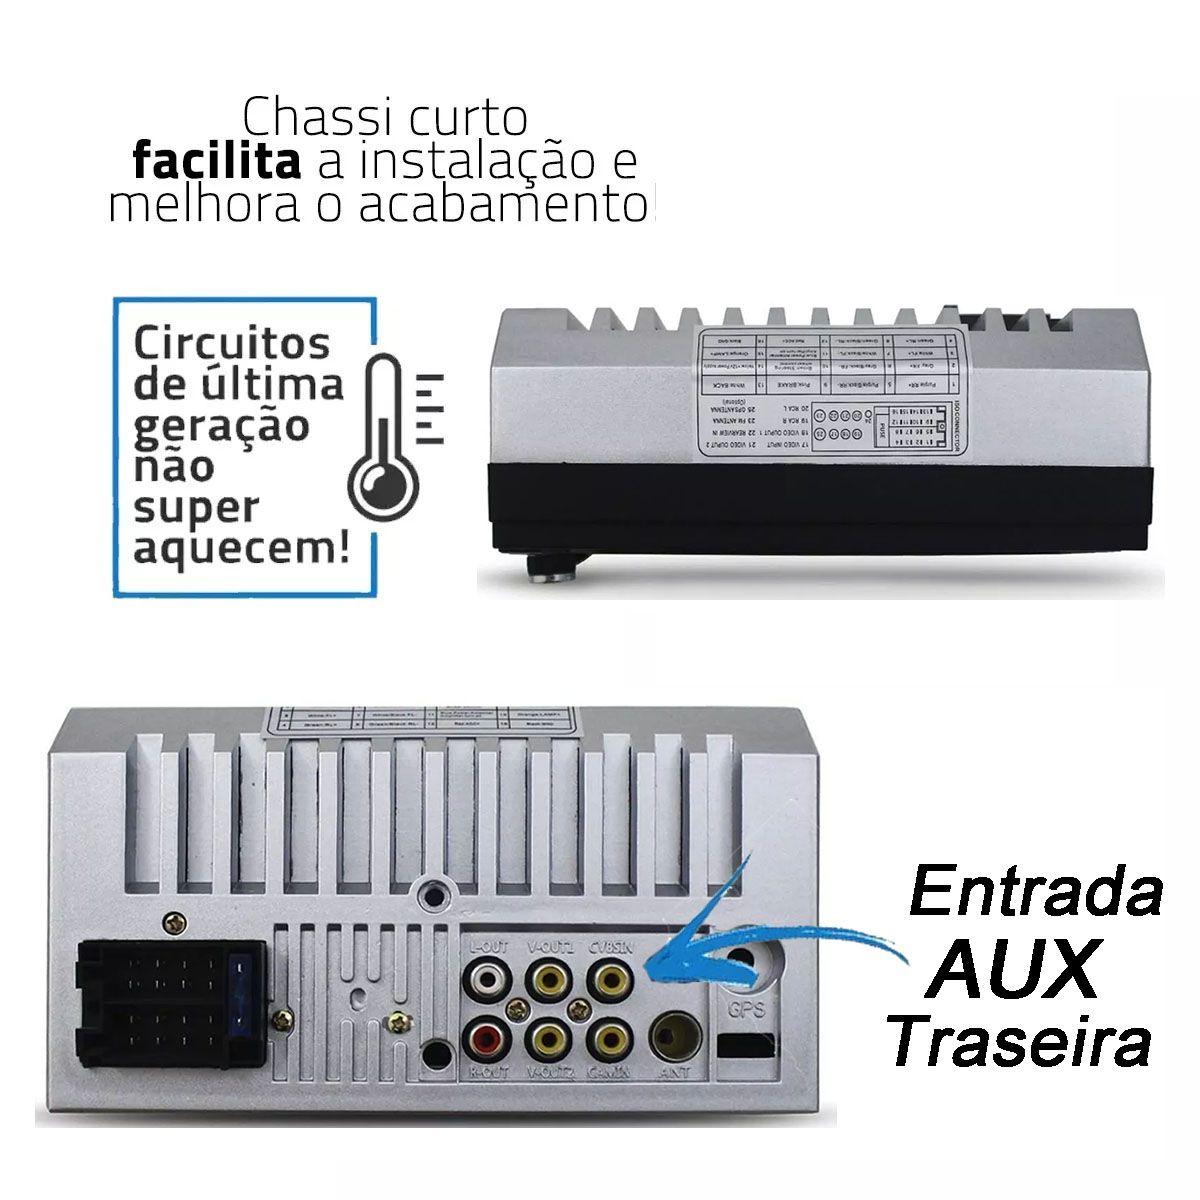 Central Multimídia First Option Chevrolet 7 Polegadas + Moldura Onix Cobalt Spin Prisma Preto 2 Din Atacado